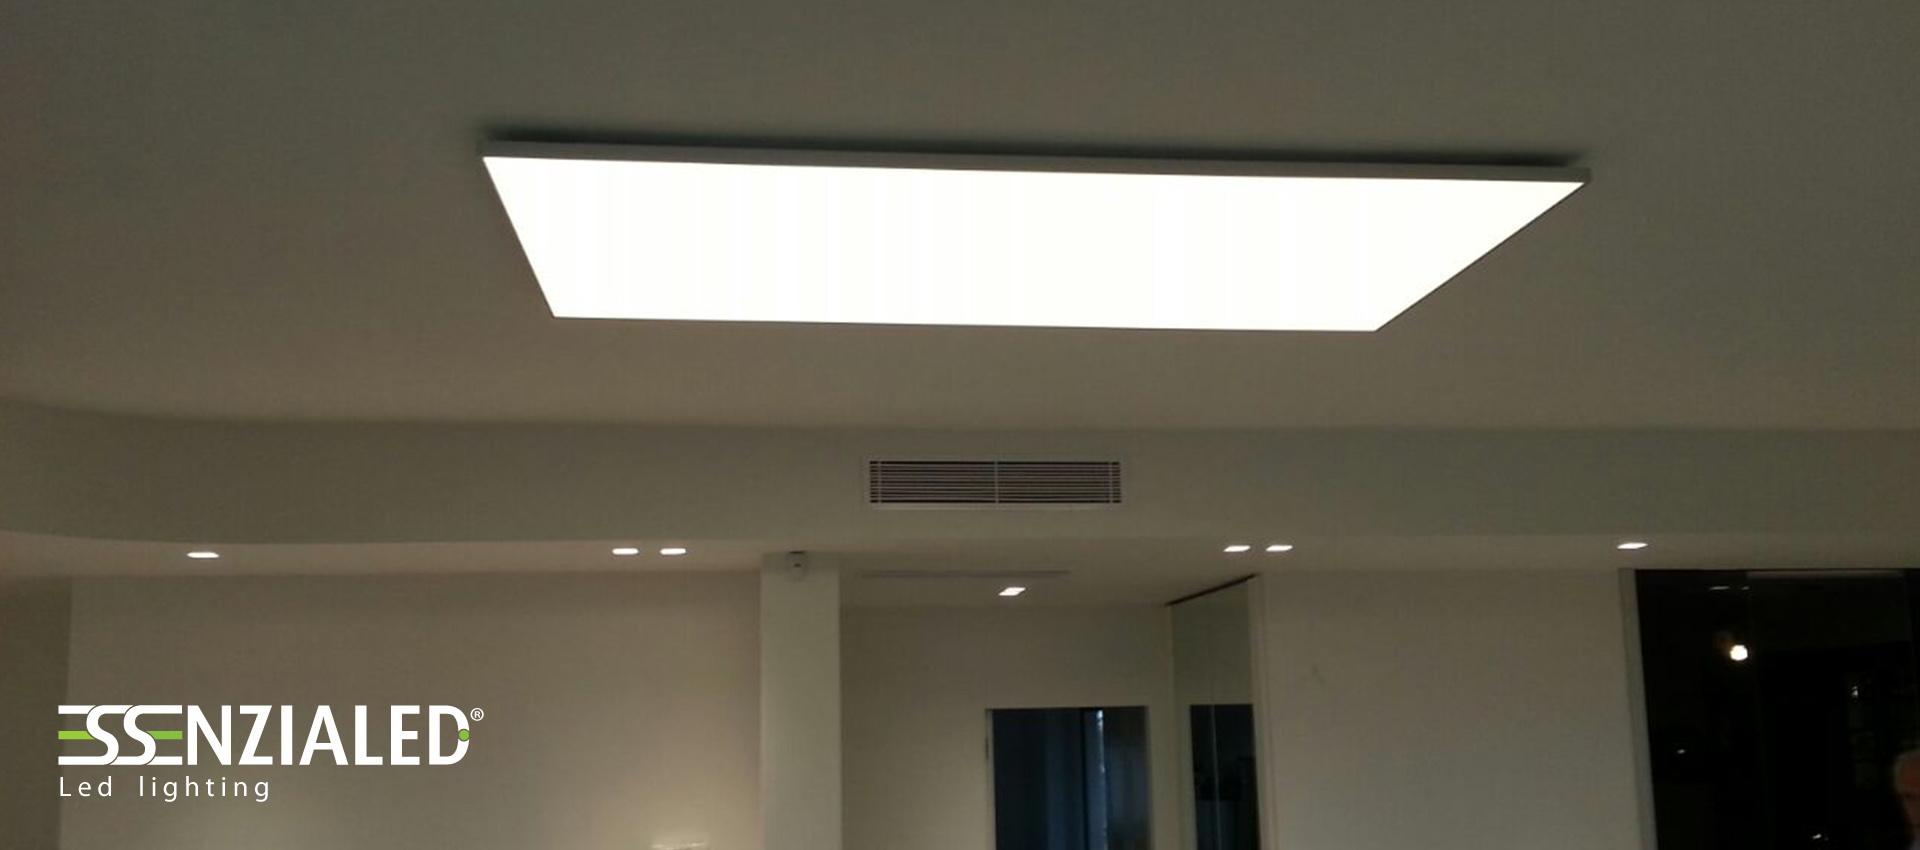 Pannelli Luminosi A Led  flexlite produzione di pannelli luminosi sottili led su, led panel le ...